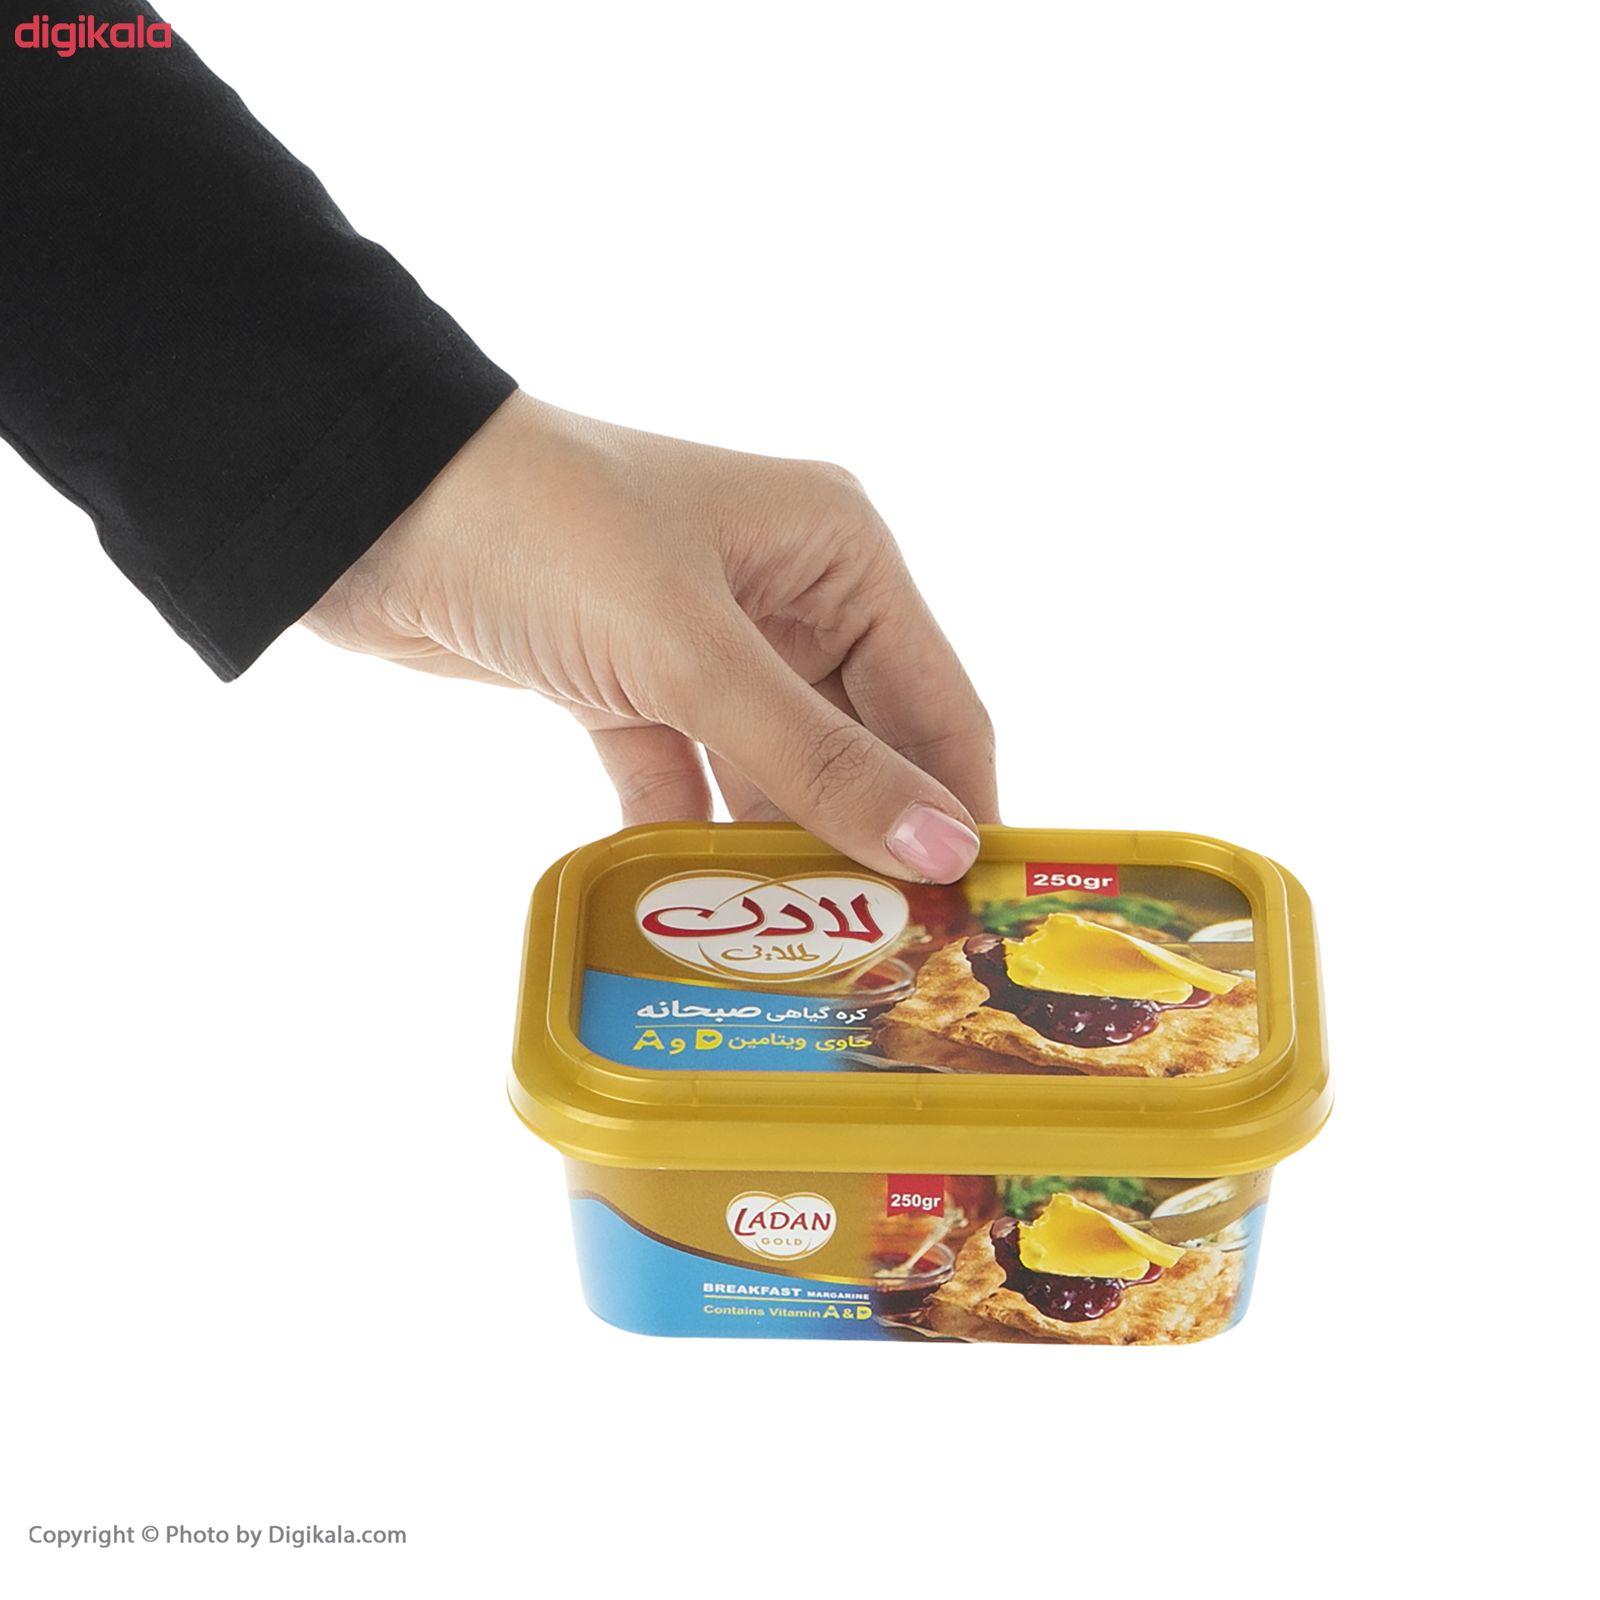 کره گیاهی صبحانه لادن - 250 گرم  main 1 2